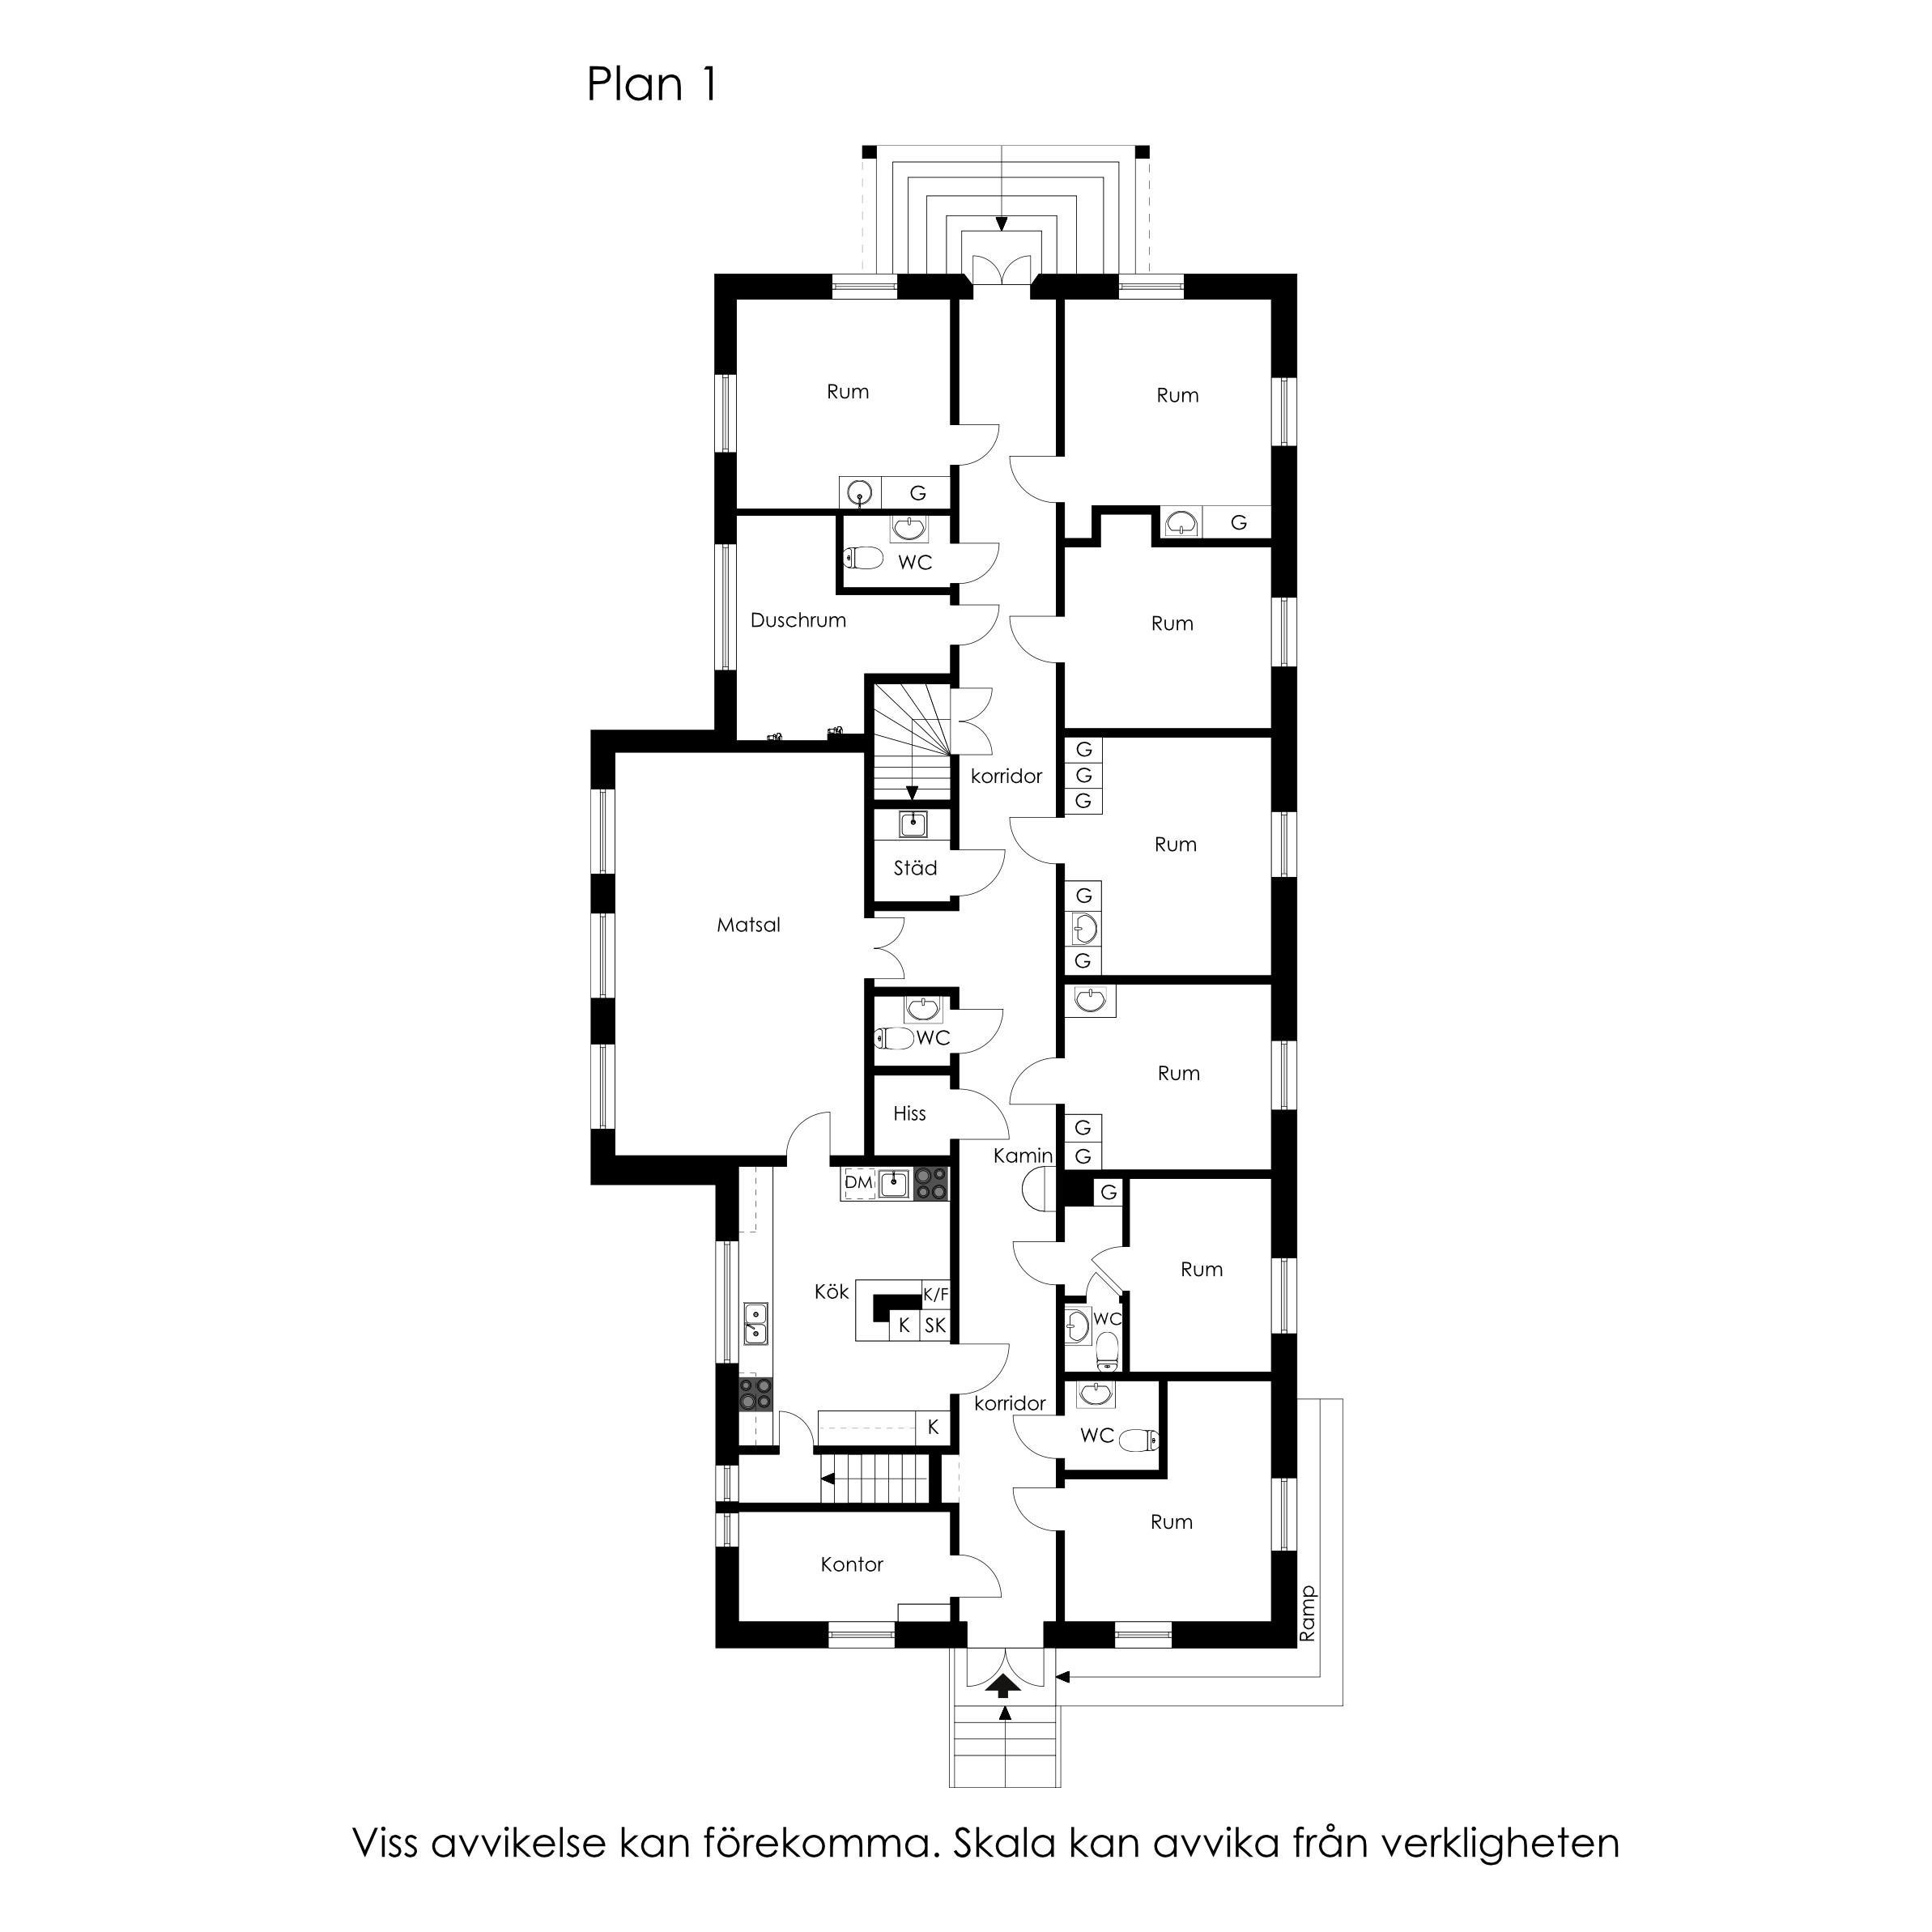 Planlösning - Plan 1